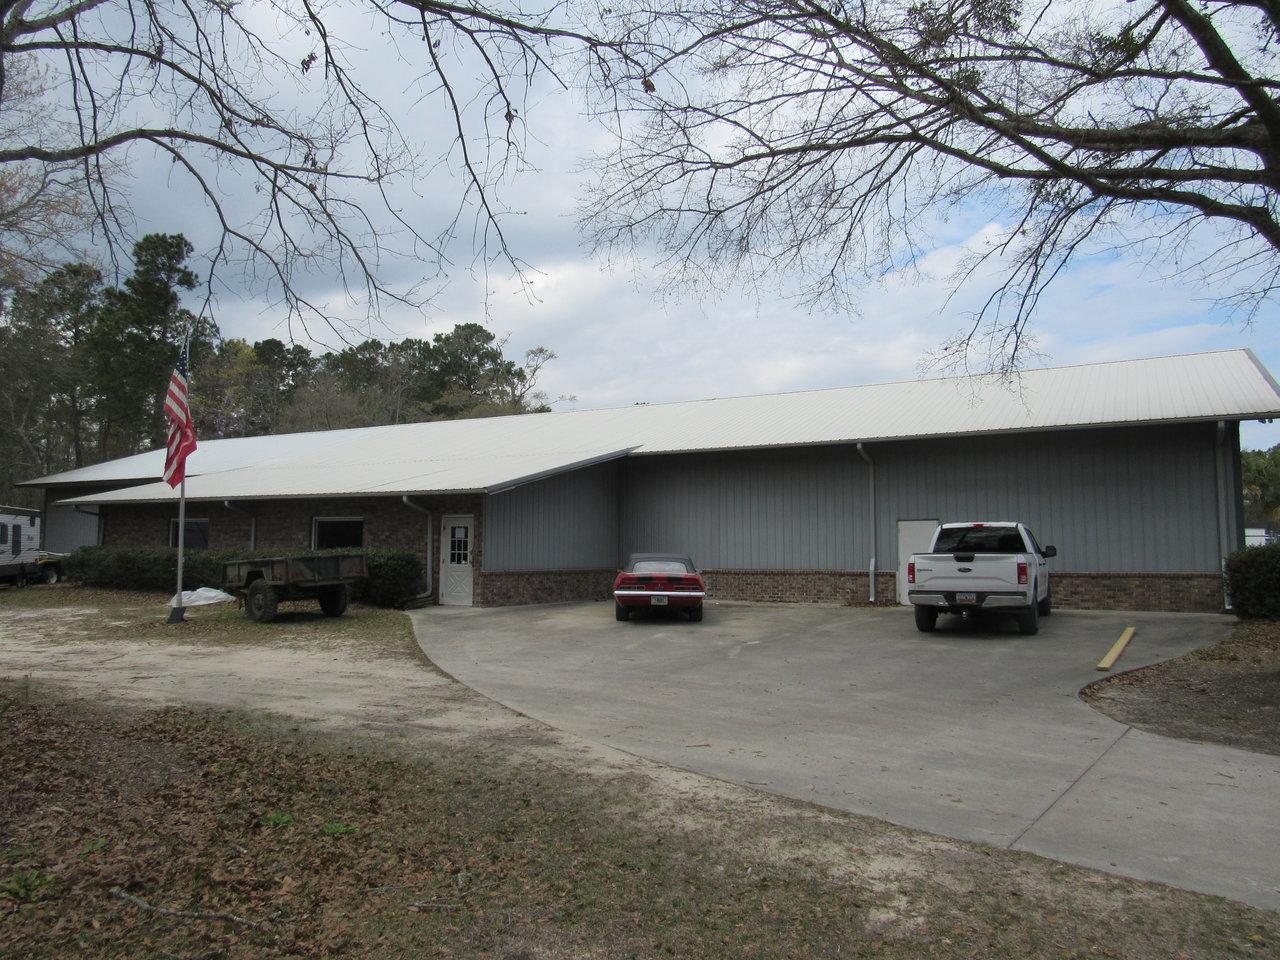 6460 Savannah Hwy, Ravenel, SC, 29470